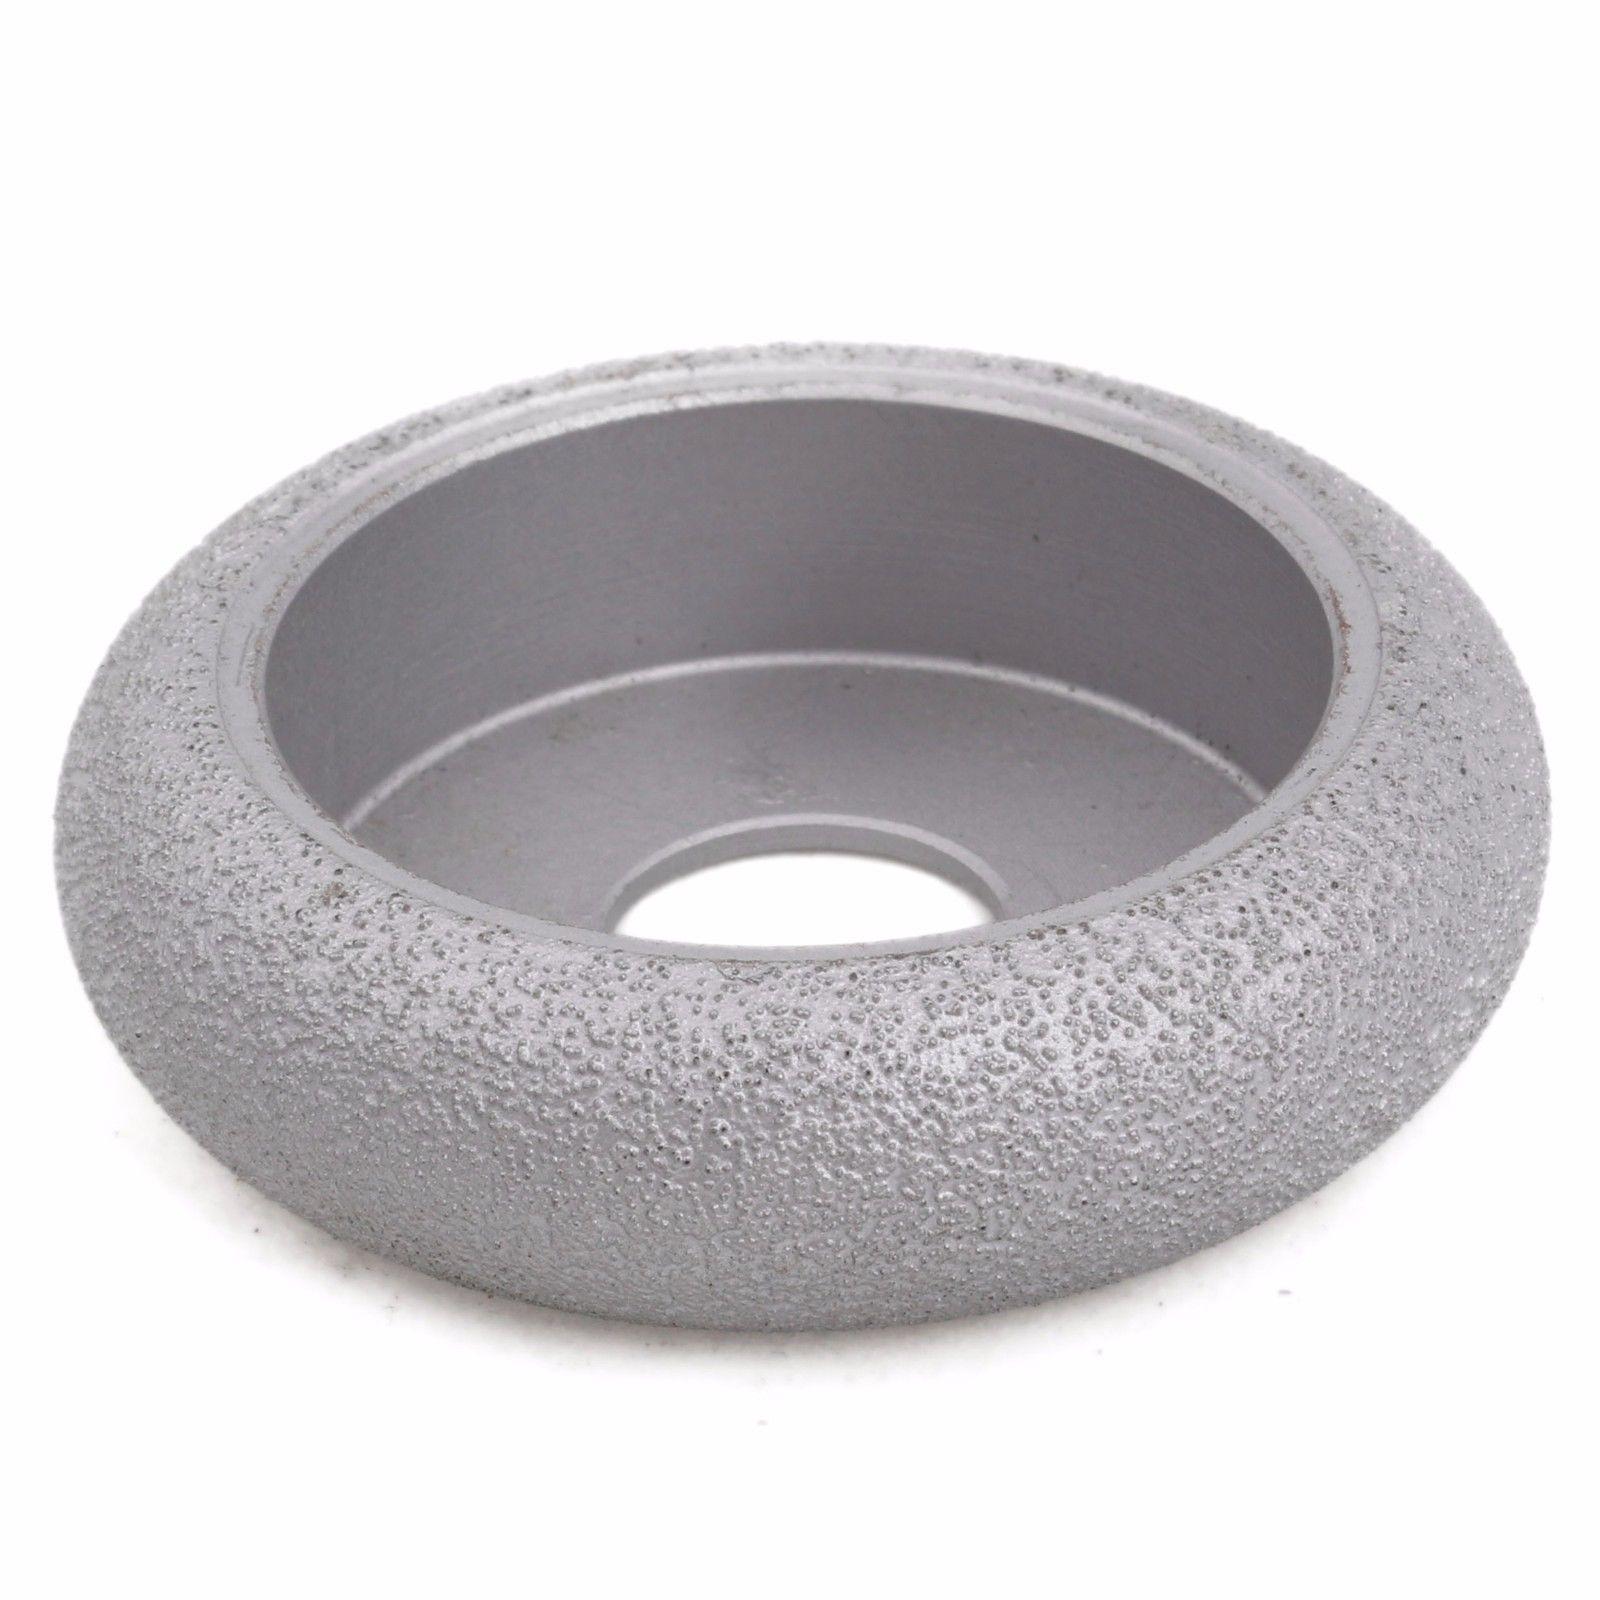 3 inch Grit 60 Width 25 mm Diamond Grinding Wheel Convex Curve BRAZED for Stone ILOVETOOL 6 inch lapidary concave arc diamond coated grinding wheel grind spherical 6 mm ilovetool